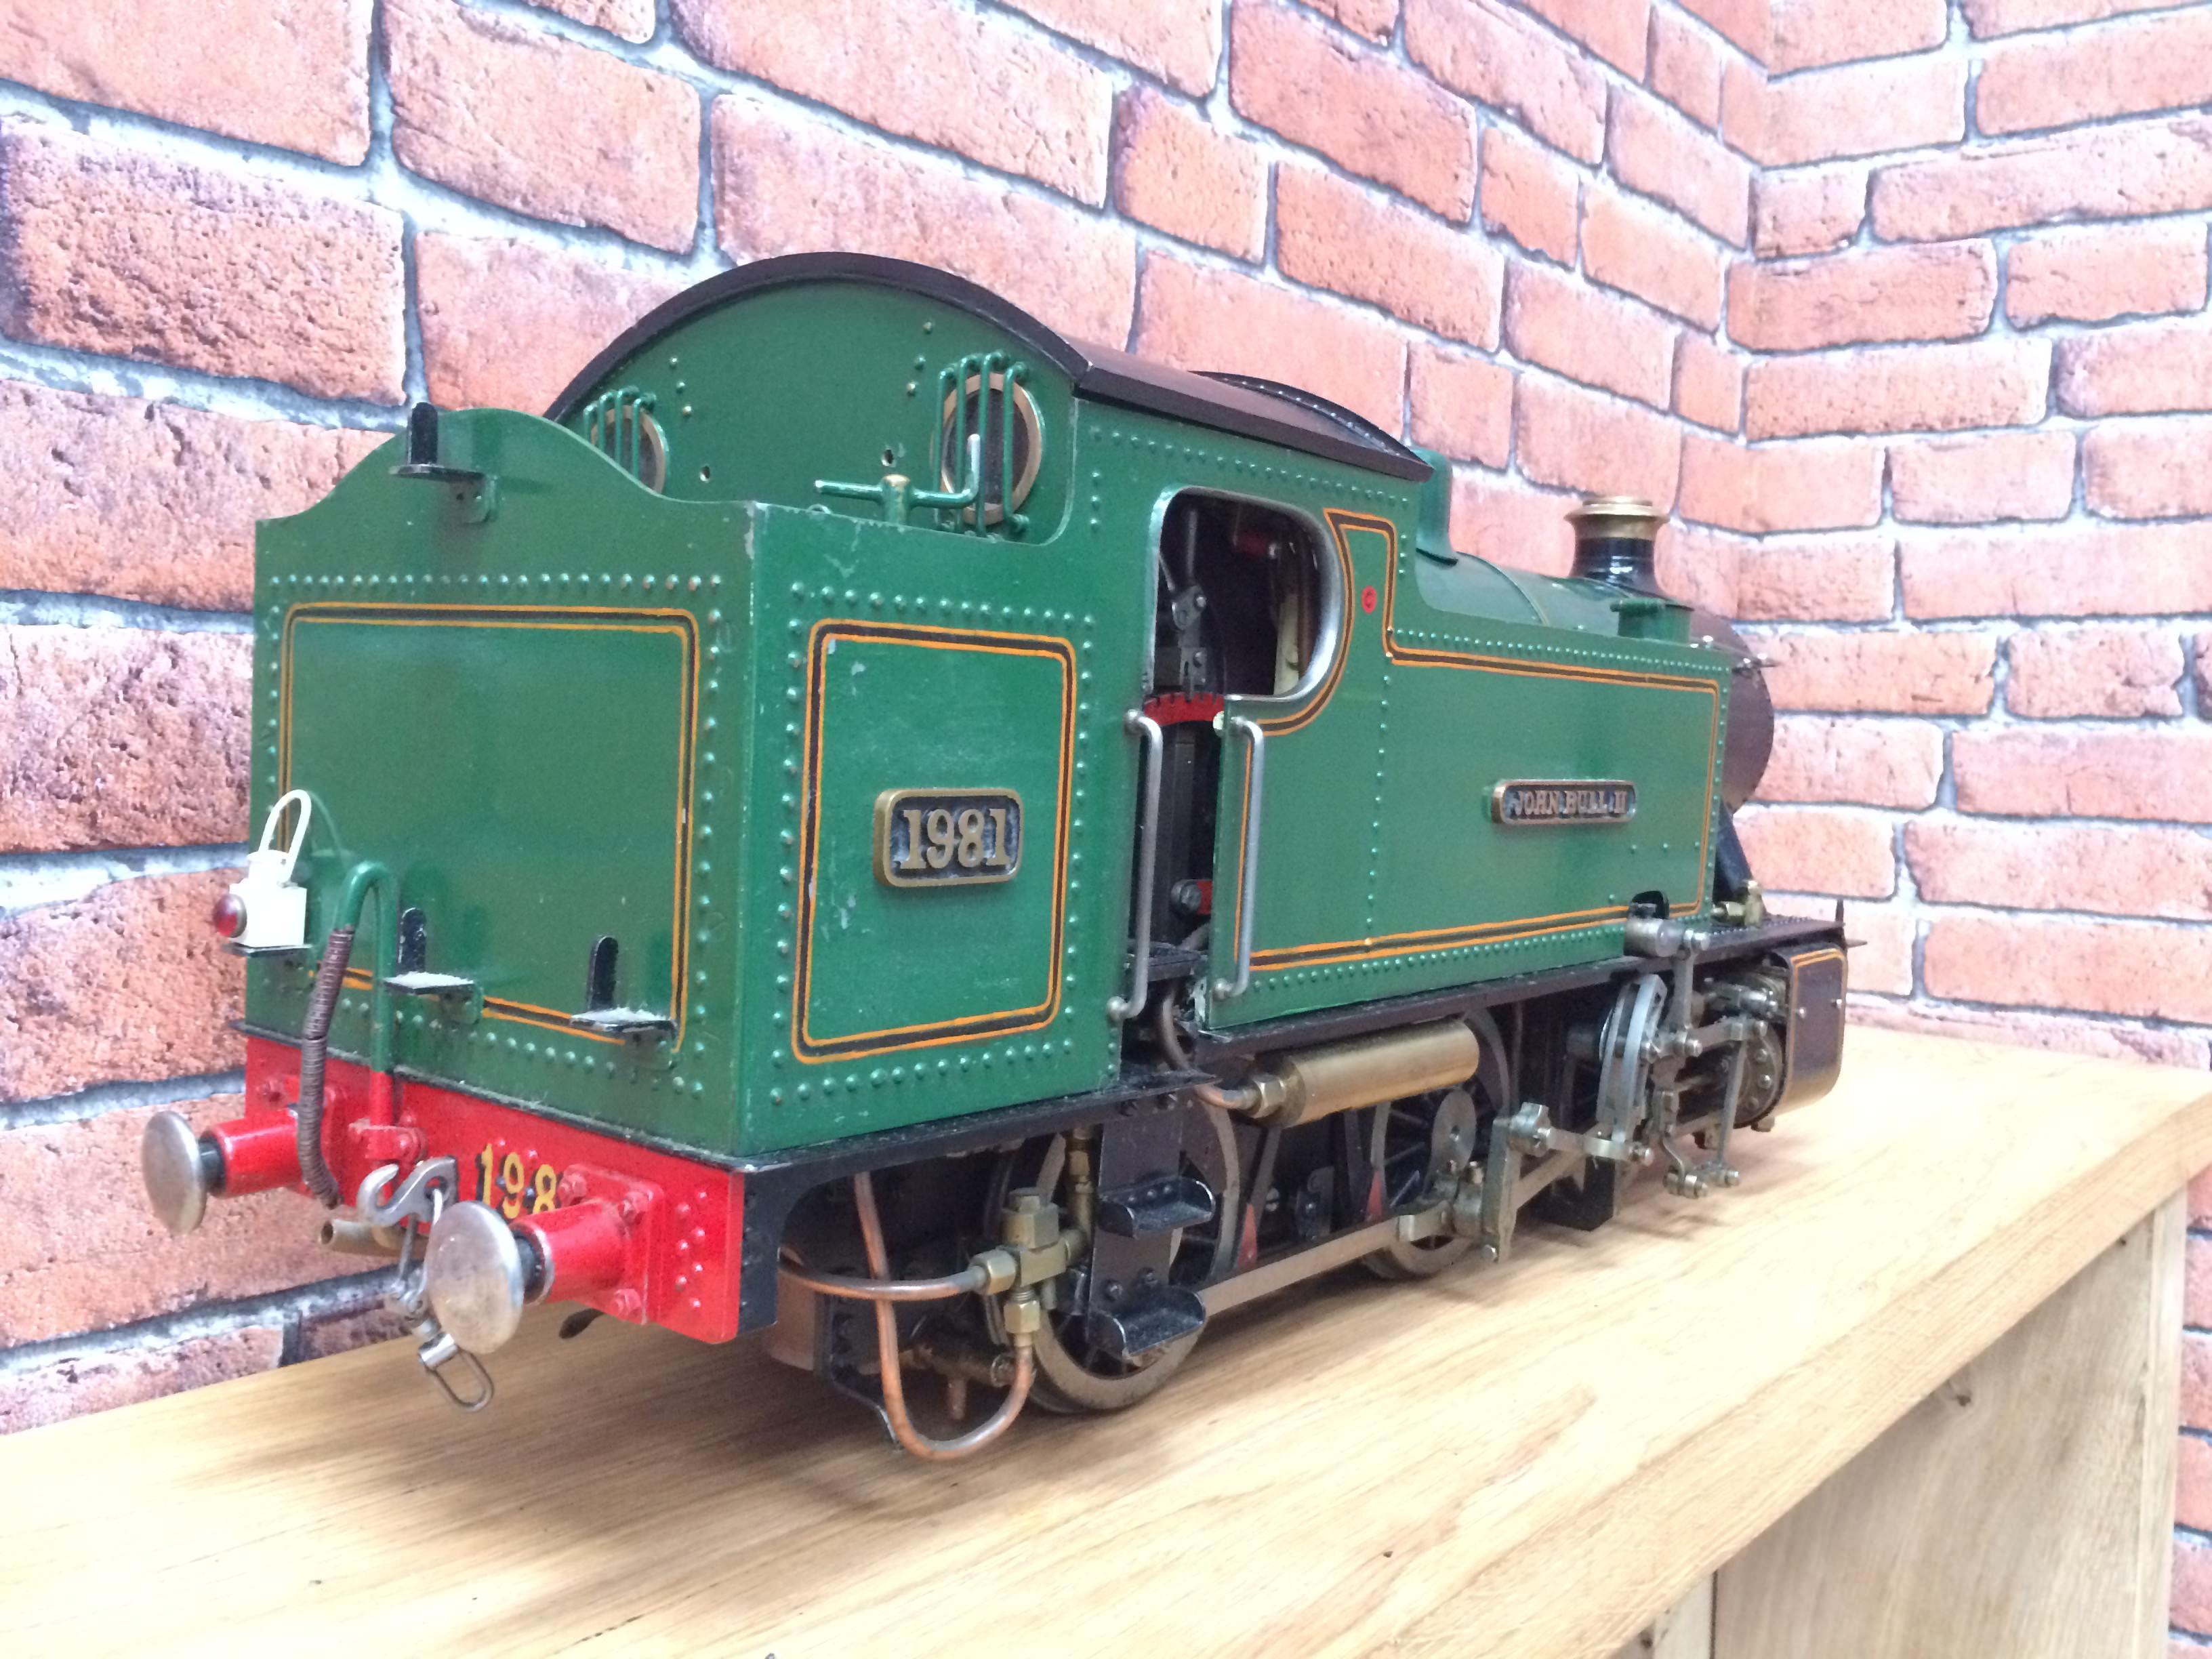 test 3 inch gauge freelance live steam tank engine for sale 09